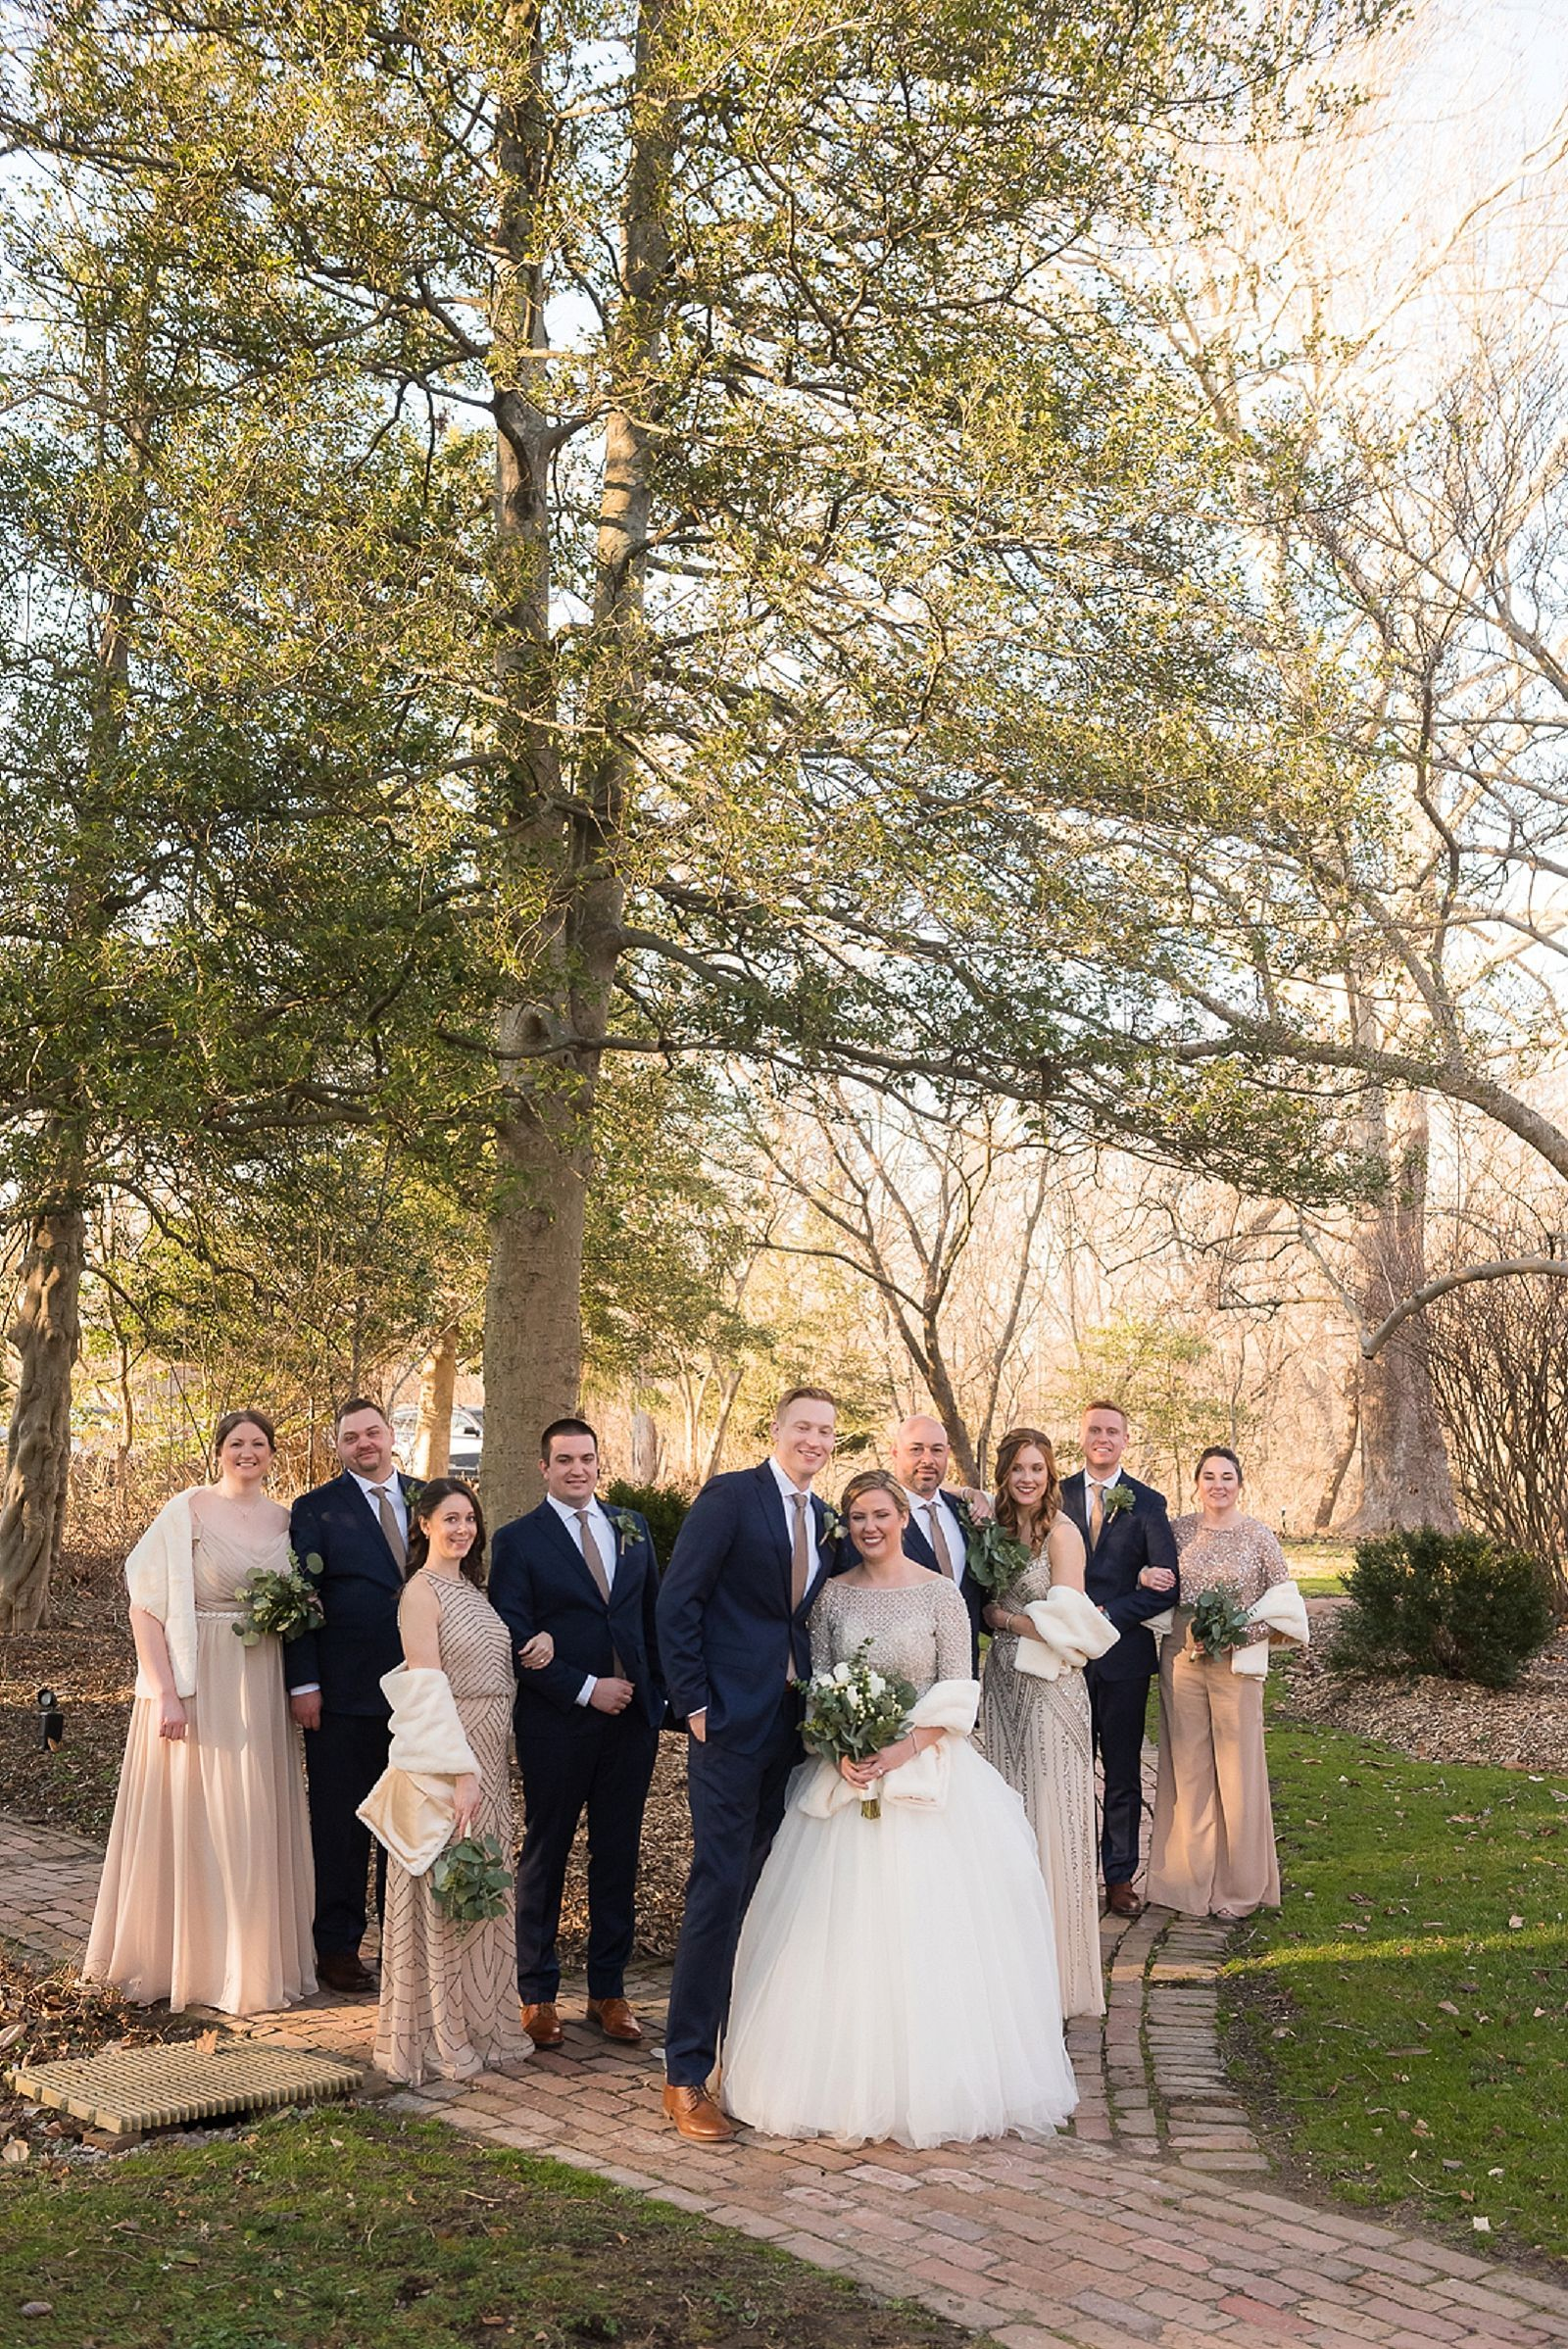 Warm Winter Wedding At The Elkridge Furnace Inn In 2020 Baltimore Wedding Baltimore Wedding Photographer Winter Wedding